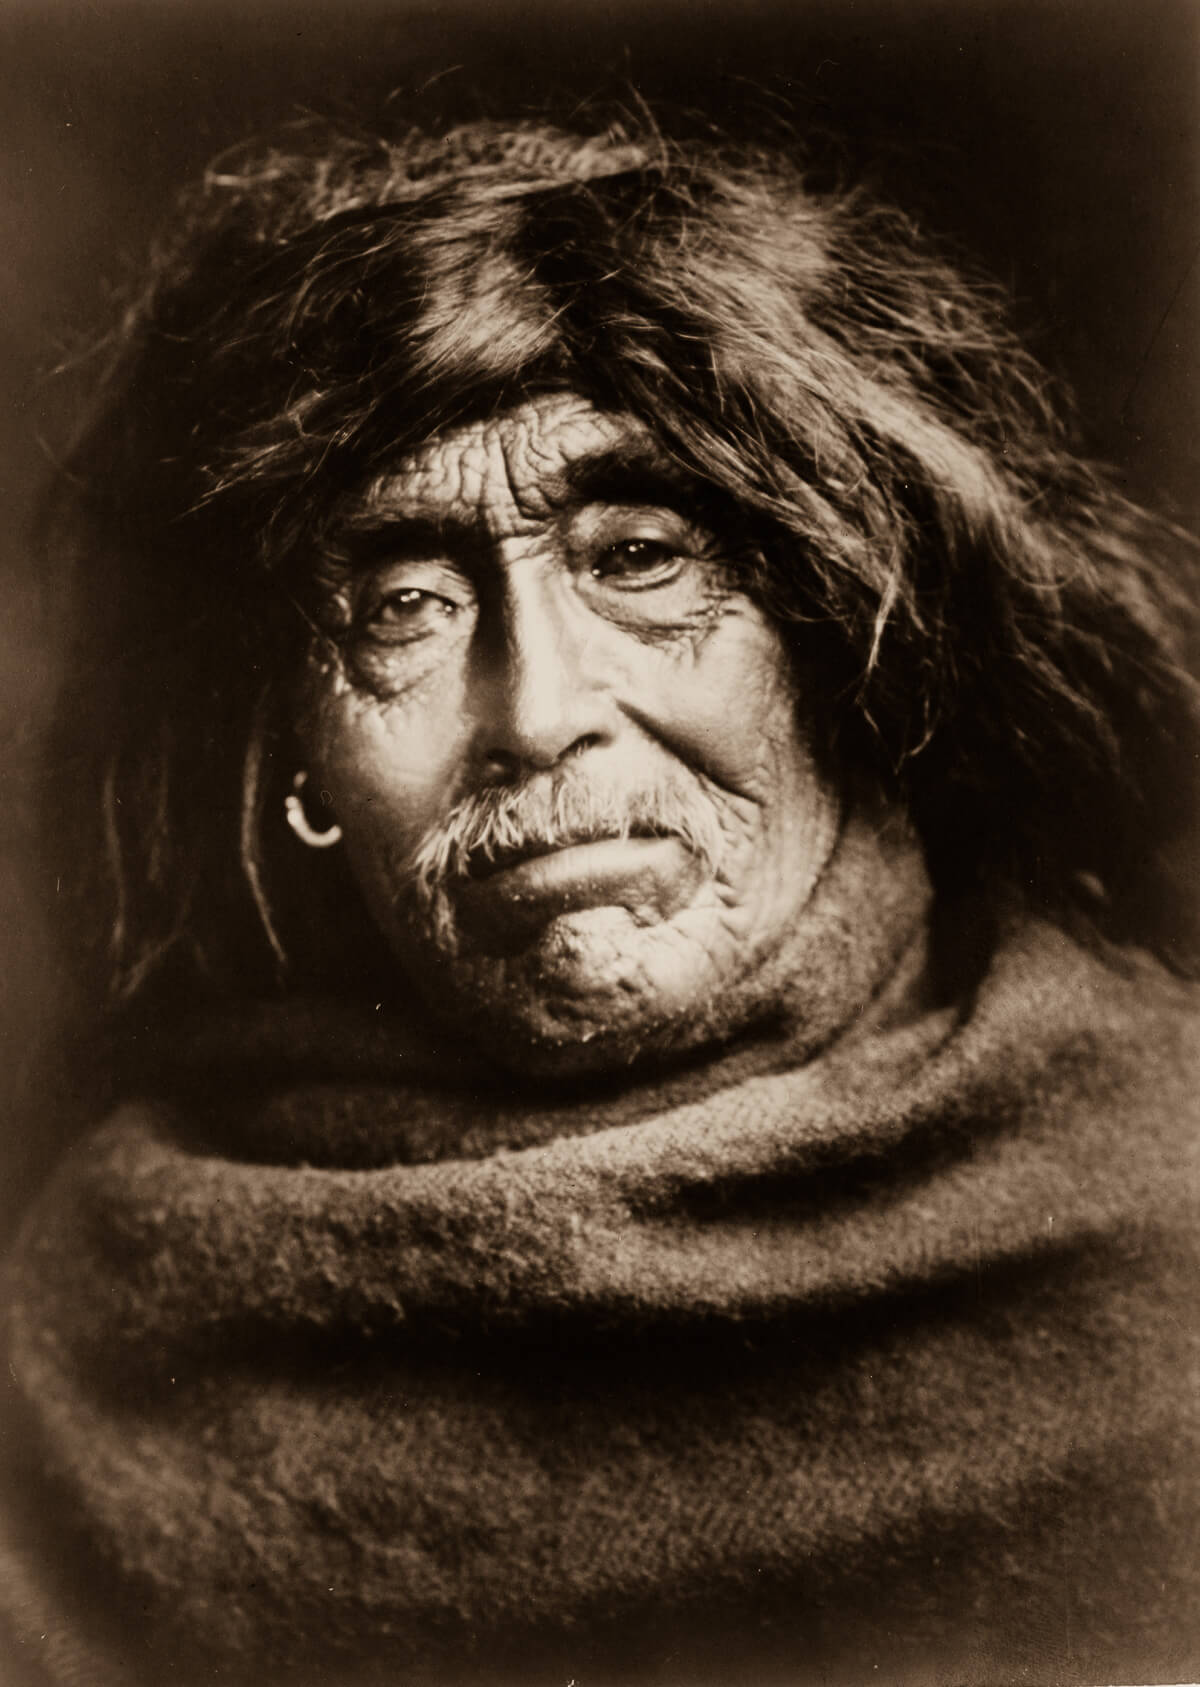 NativeAmerican-fotografia-oldskull-26